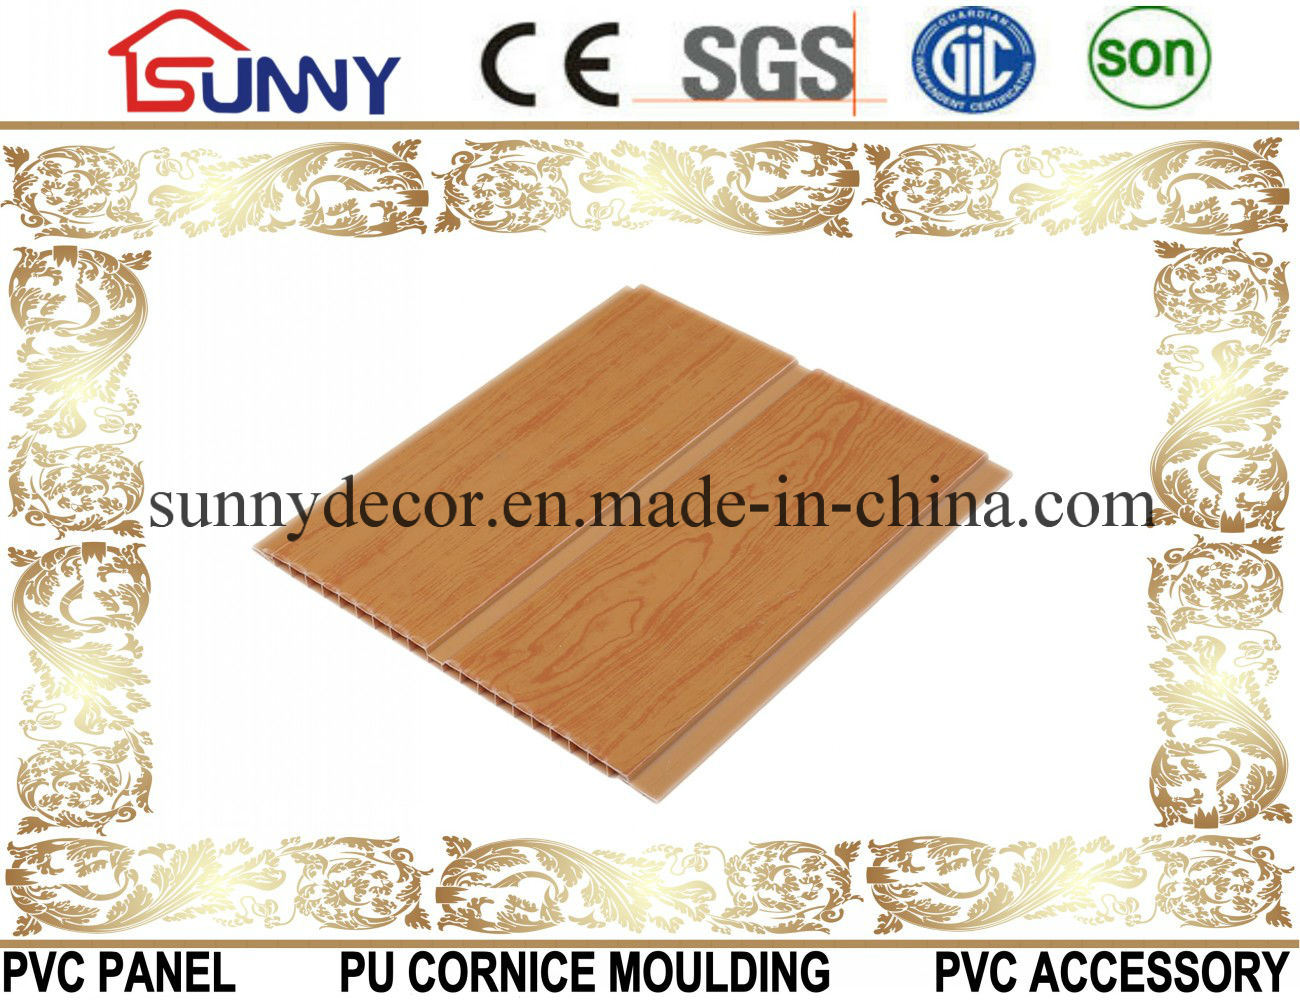 Wooden Color PVC Wall Panels, Interior Decorative PVC Tile, China Manufacturer PVC Ceilings